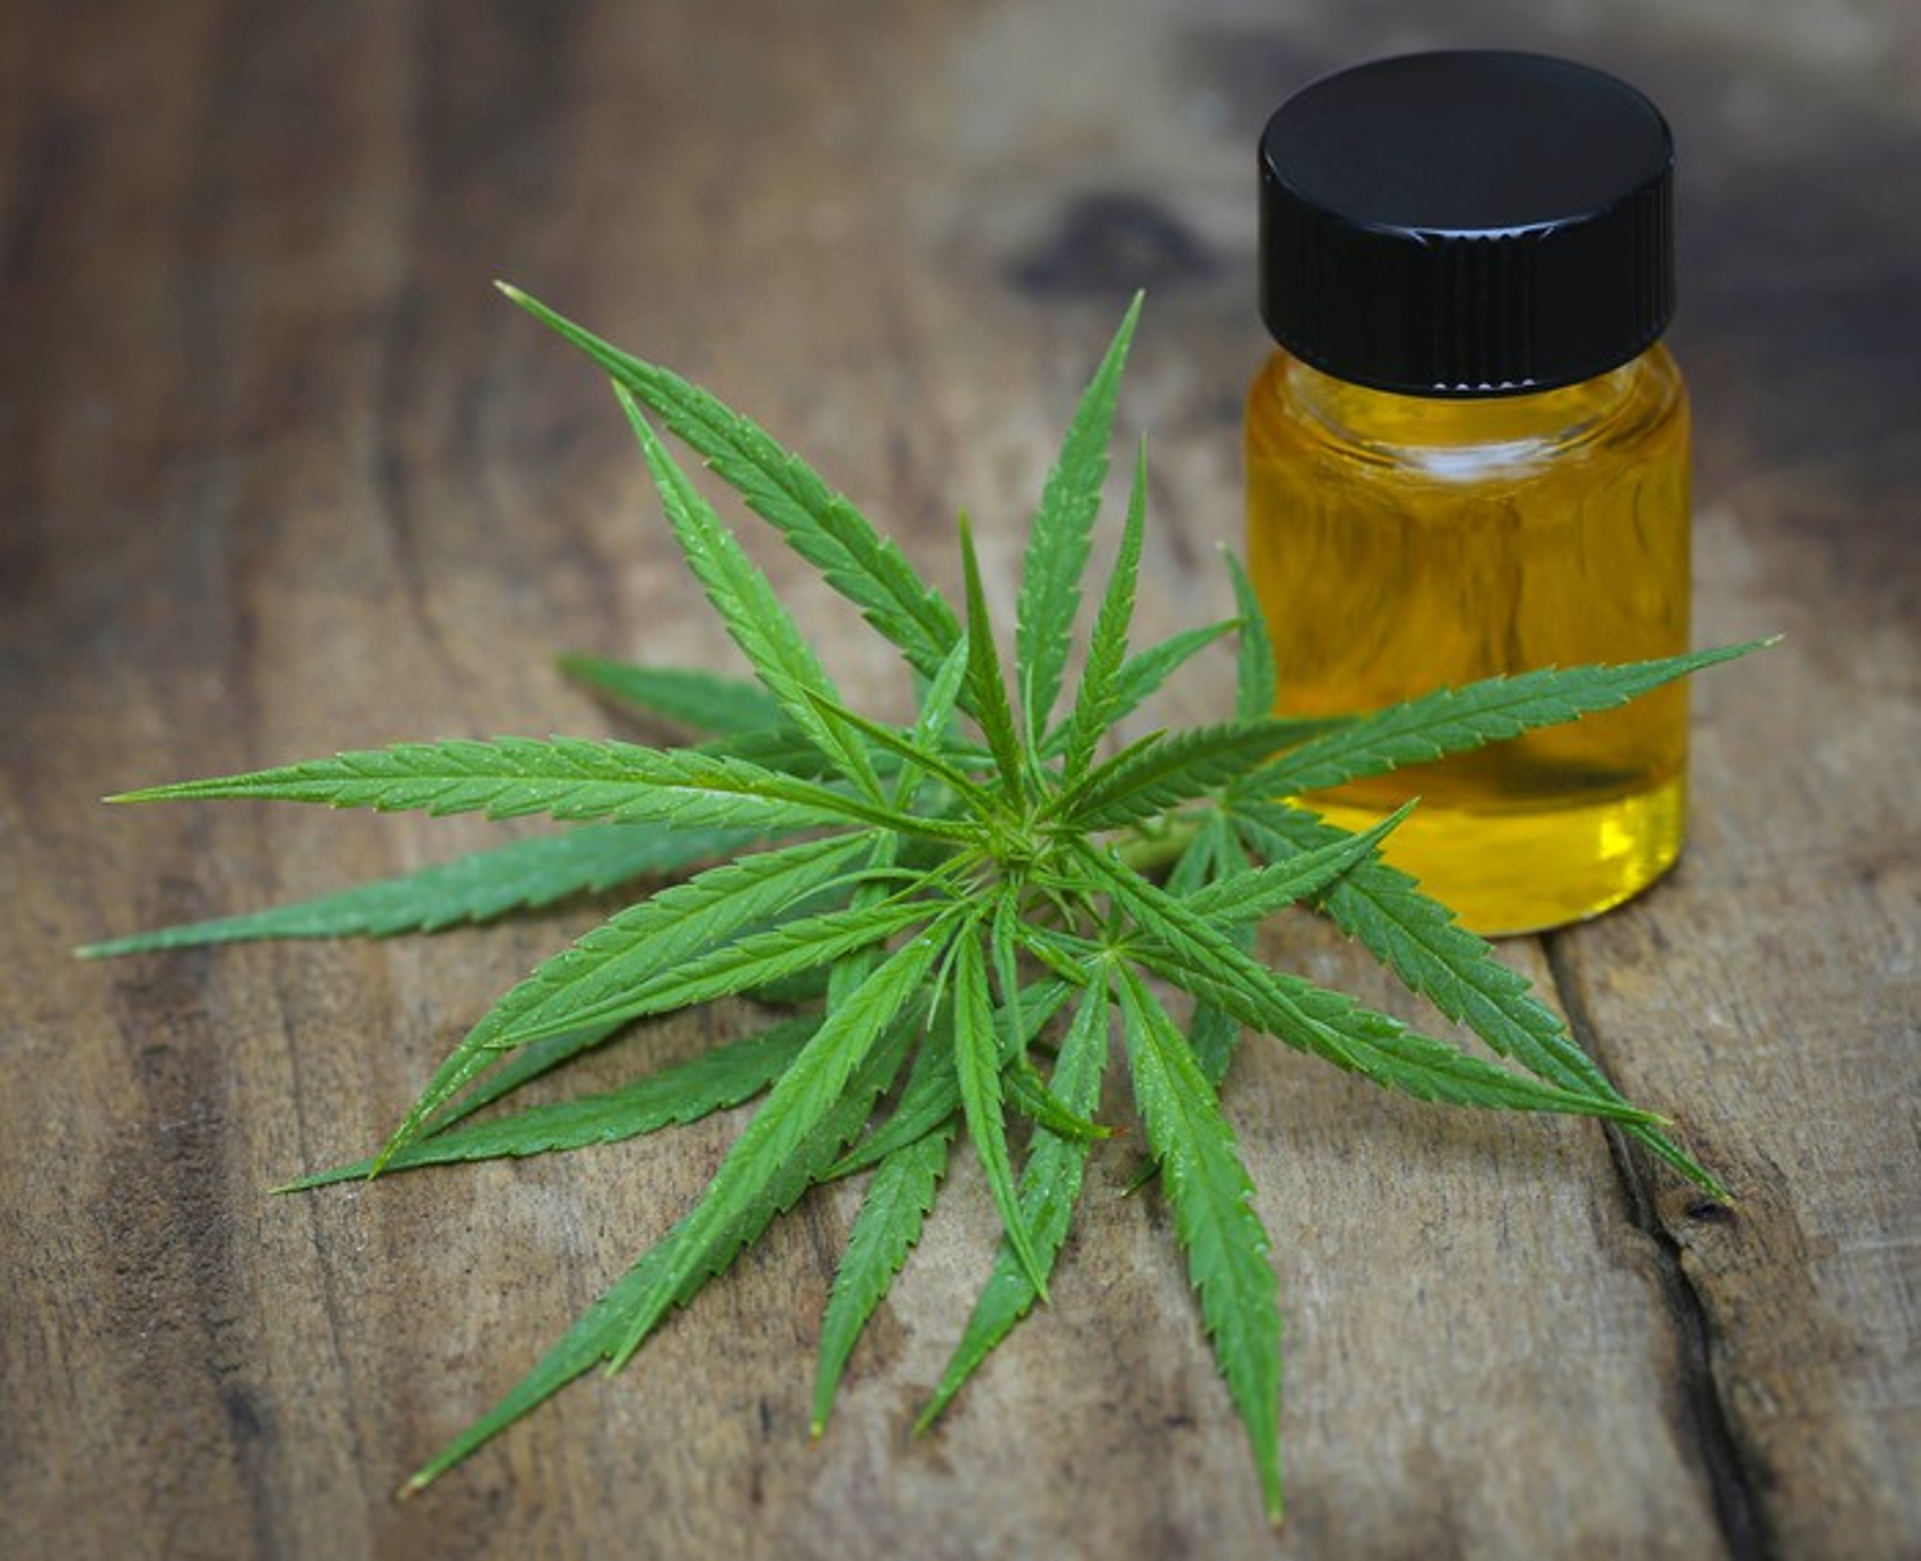 A cannabis leaf next to a bottle of cannabis oil.